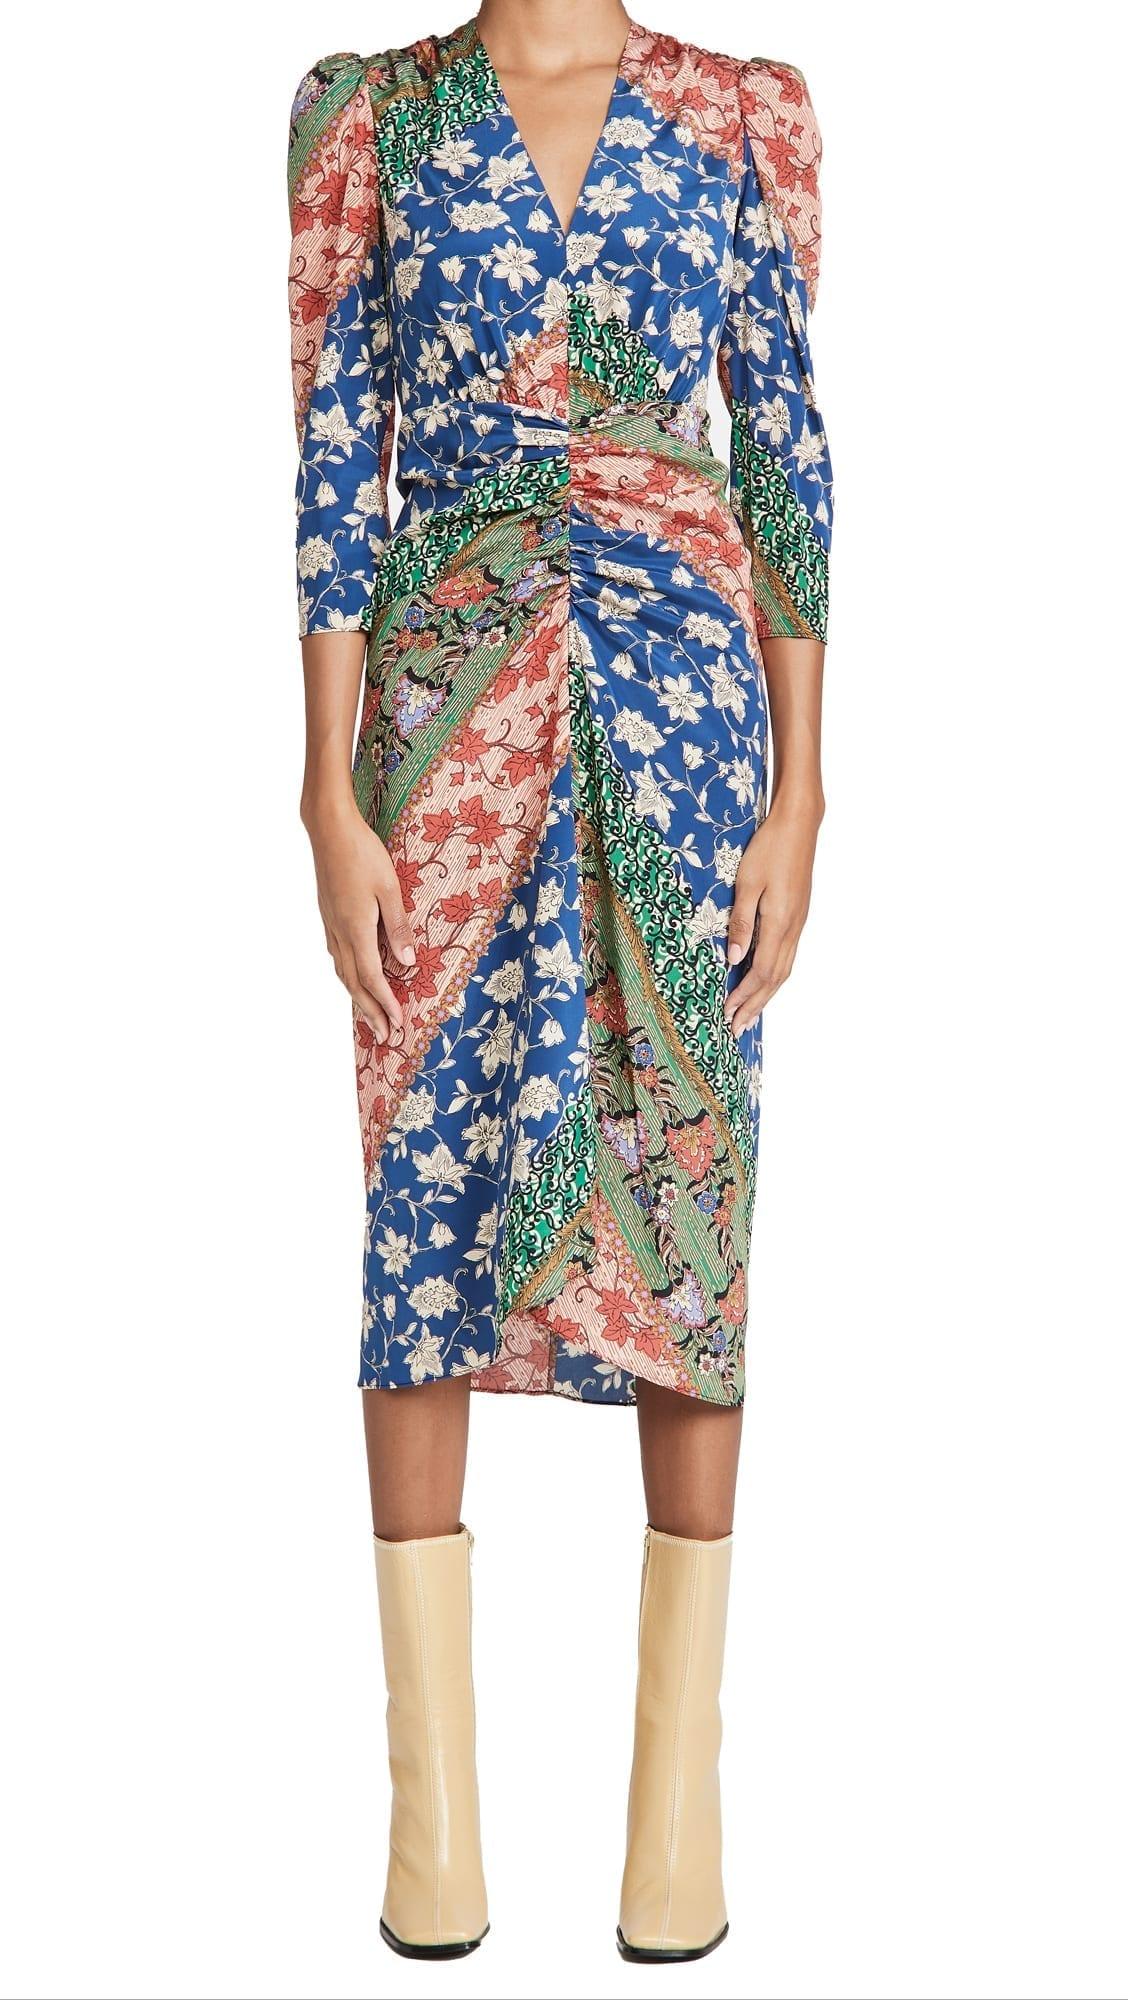 VERONICA BEARD Mary Dress